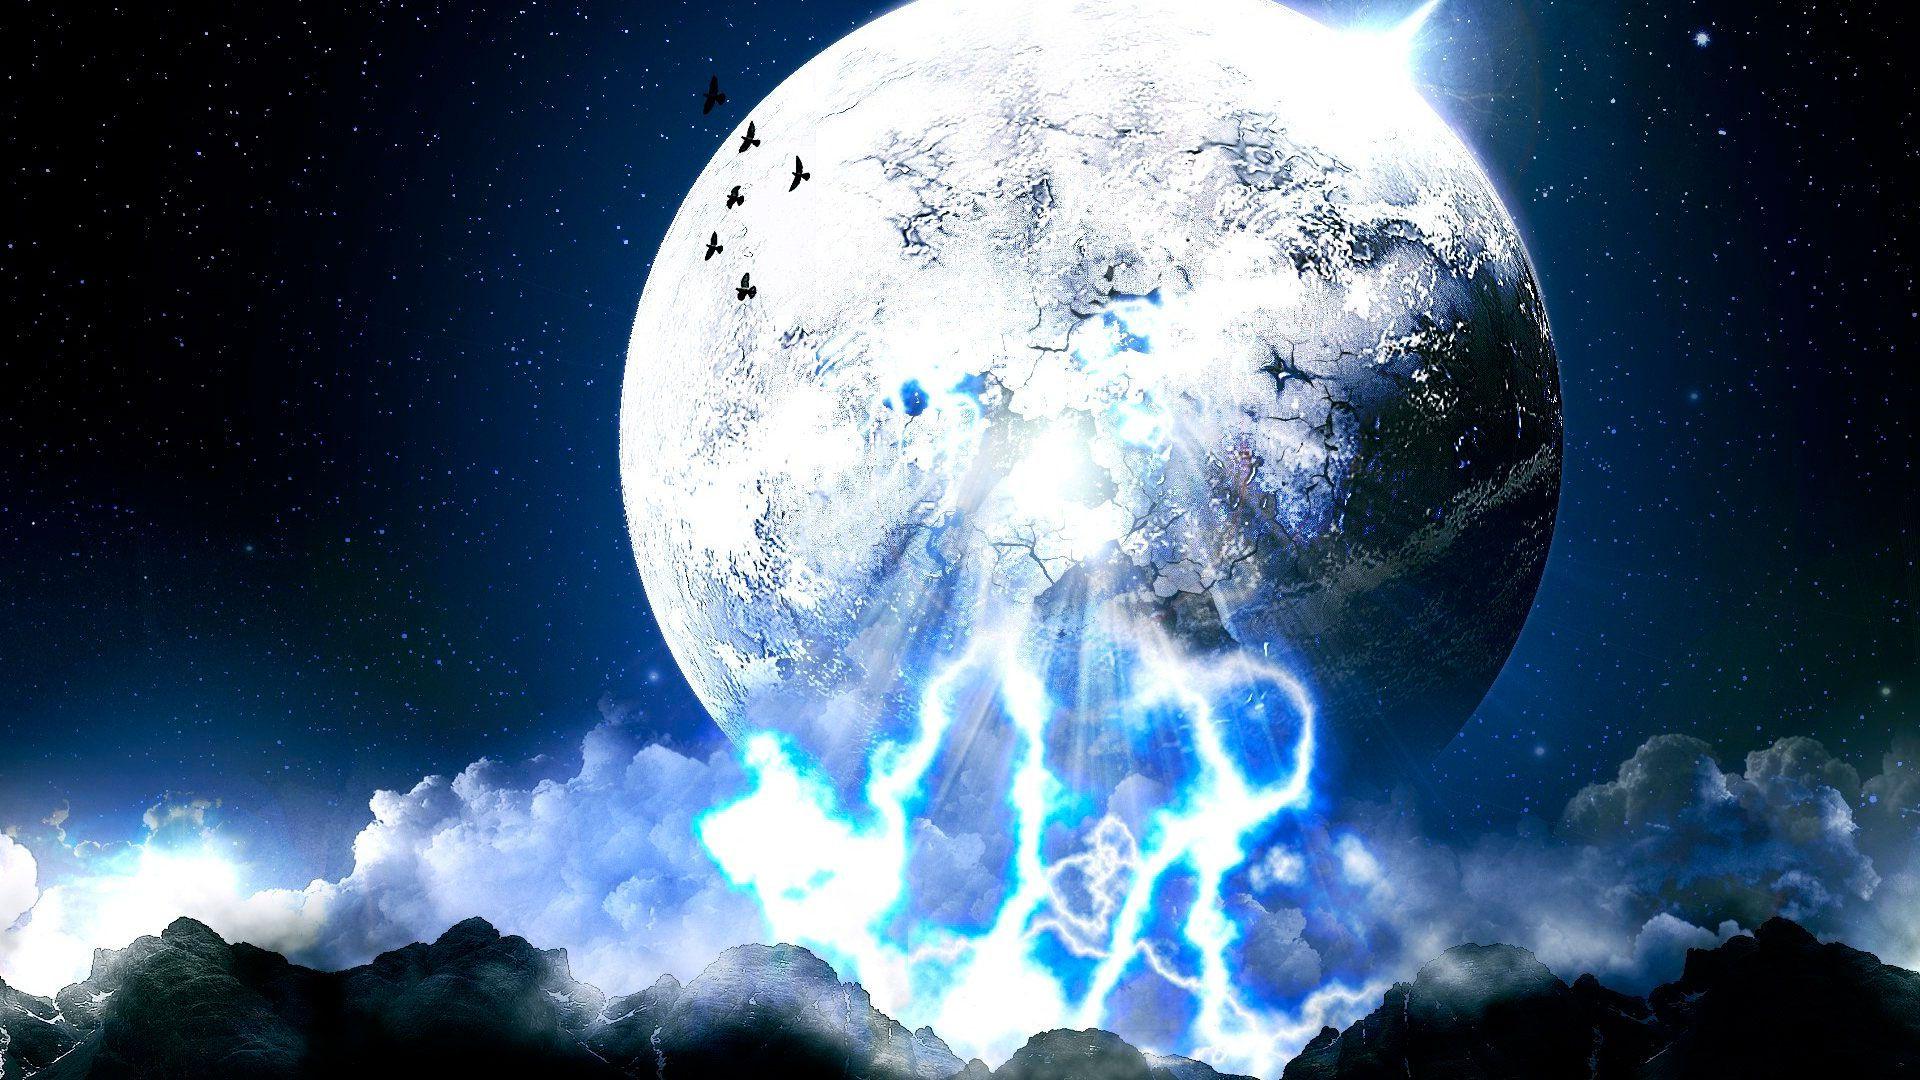 Moon hd wallpaper download